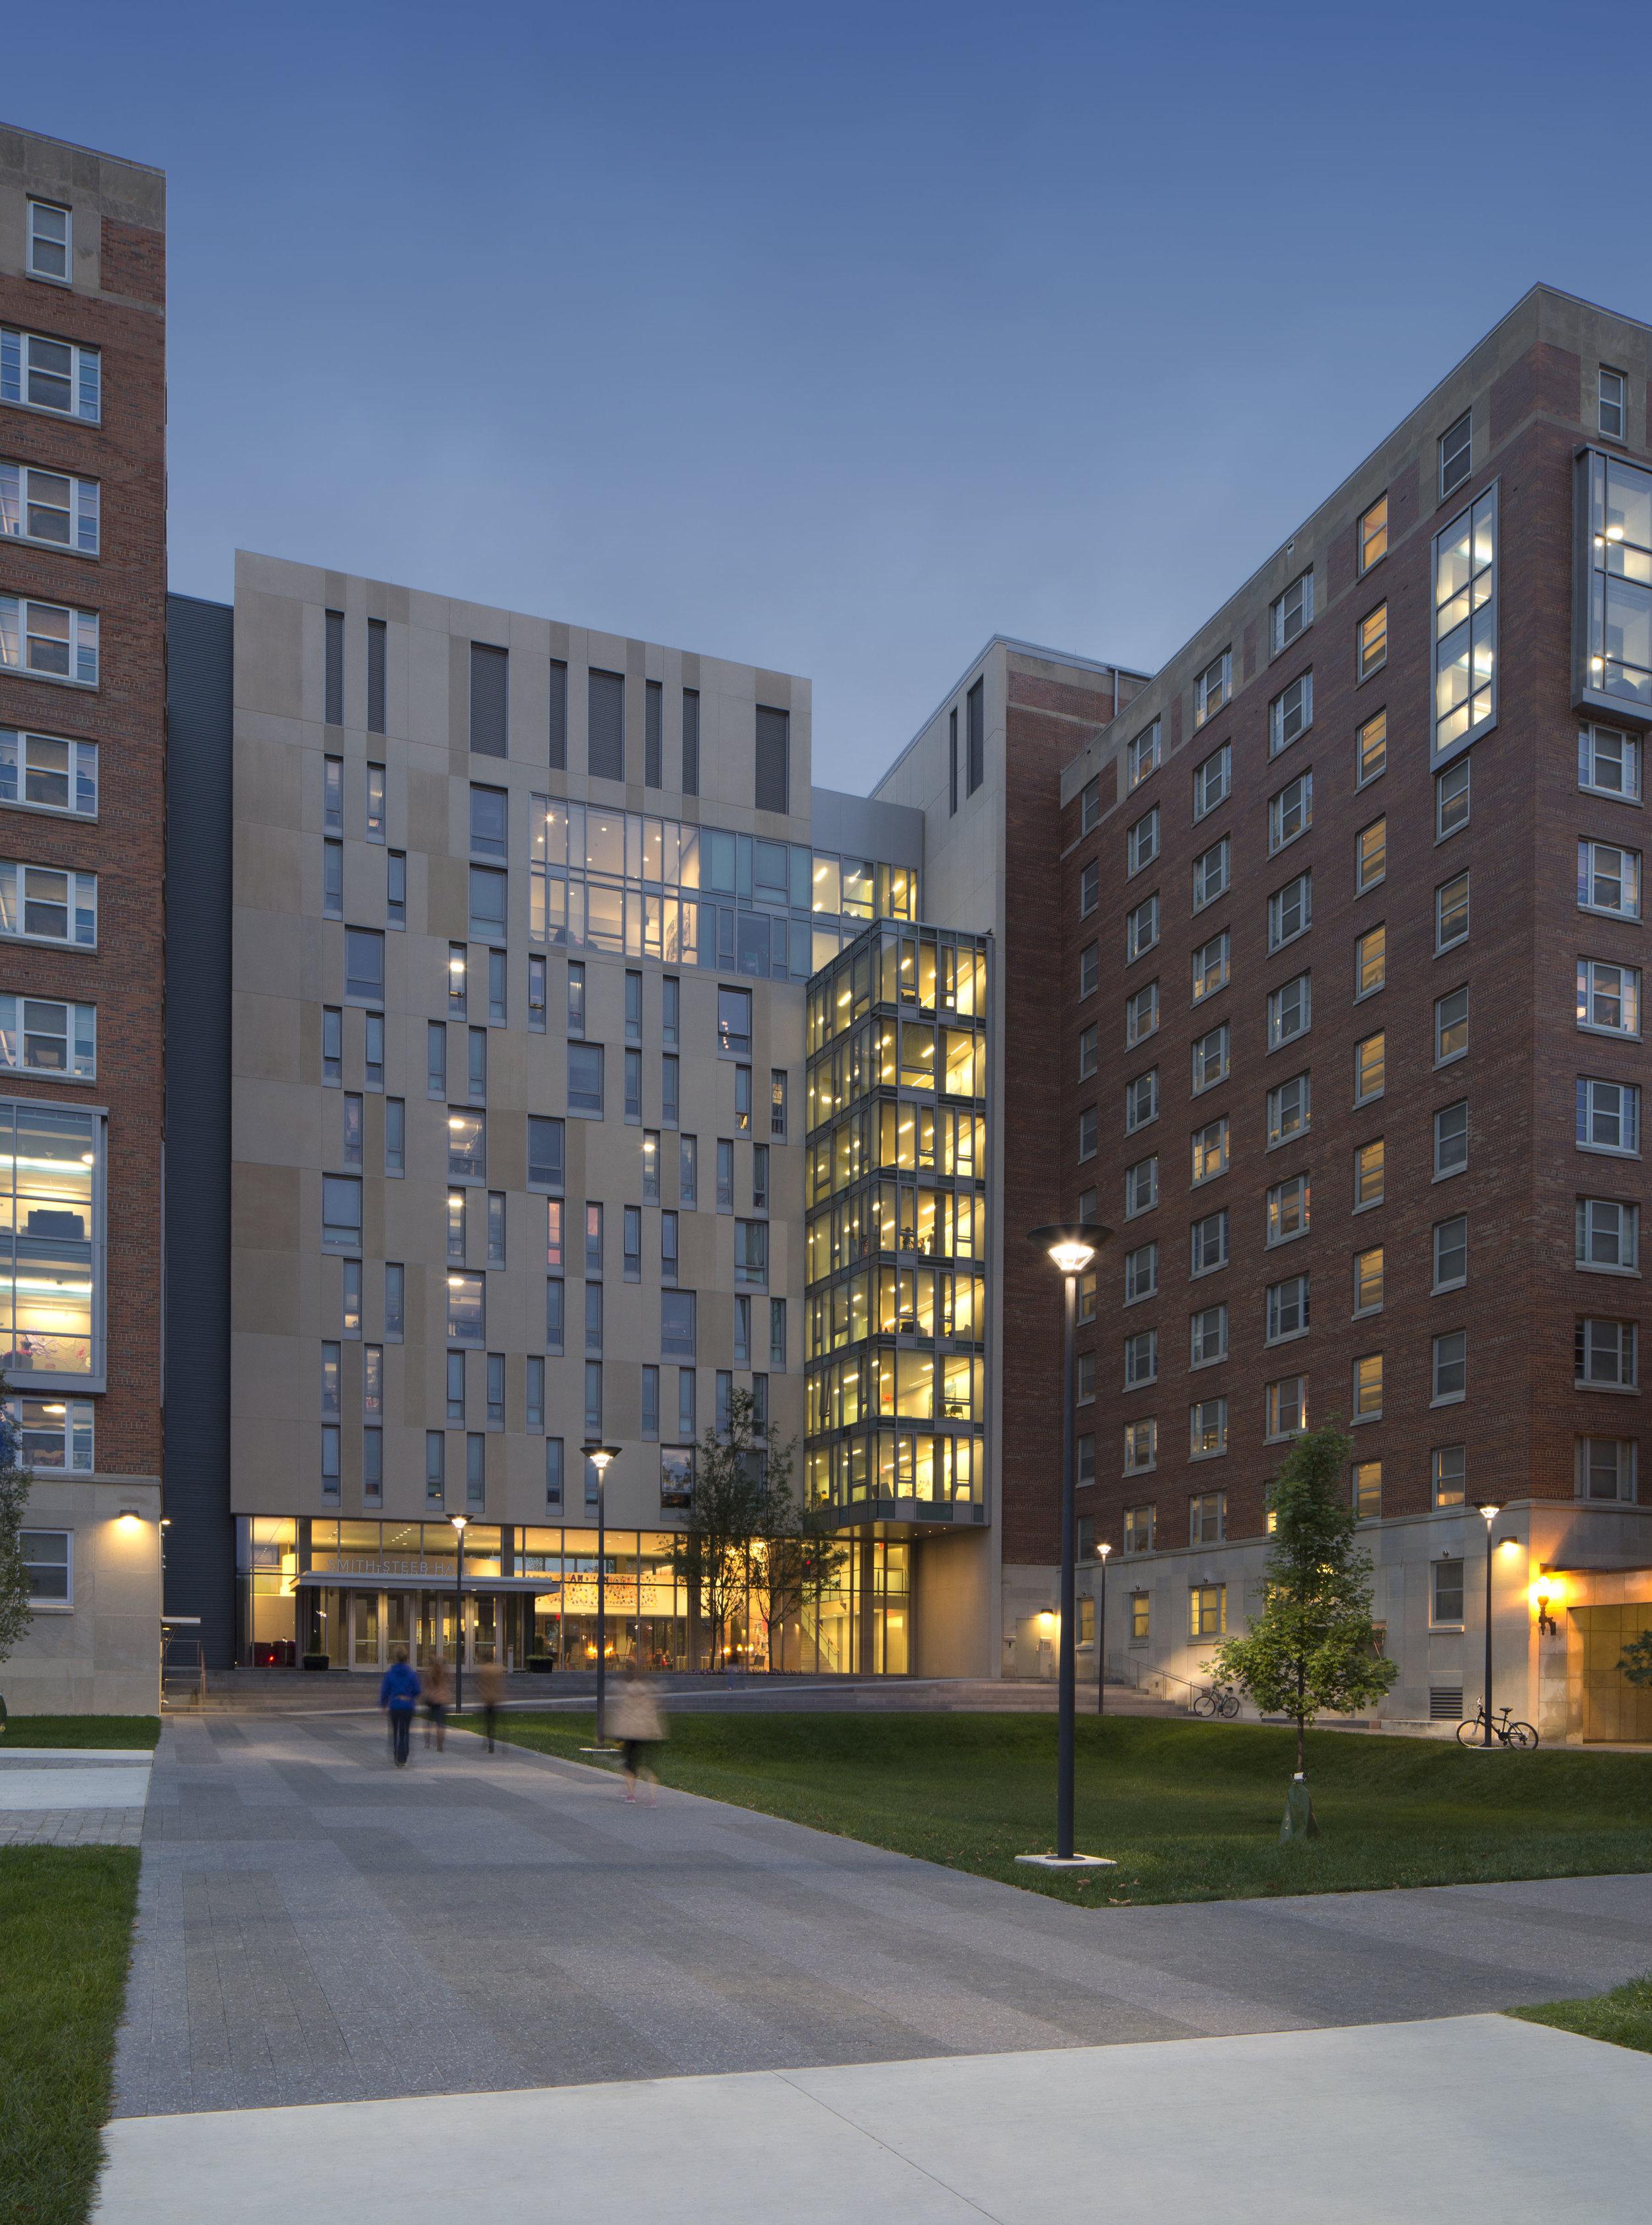 Architect: OSU South High Rises